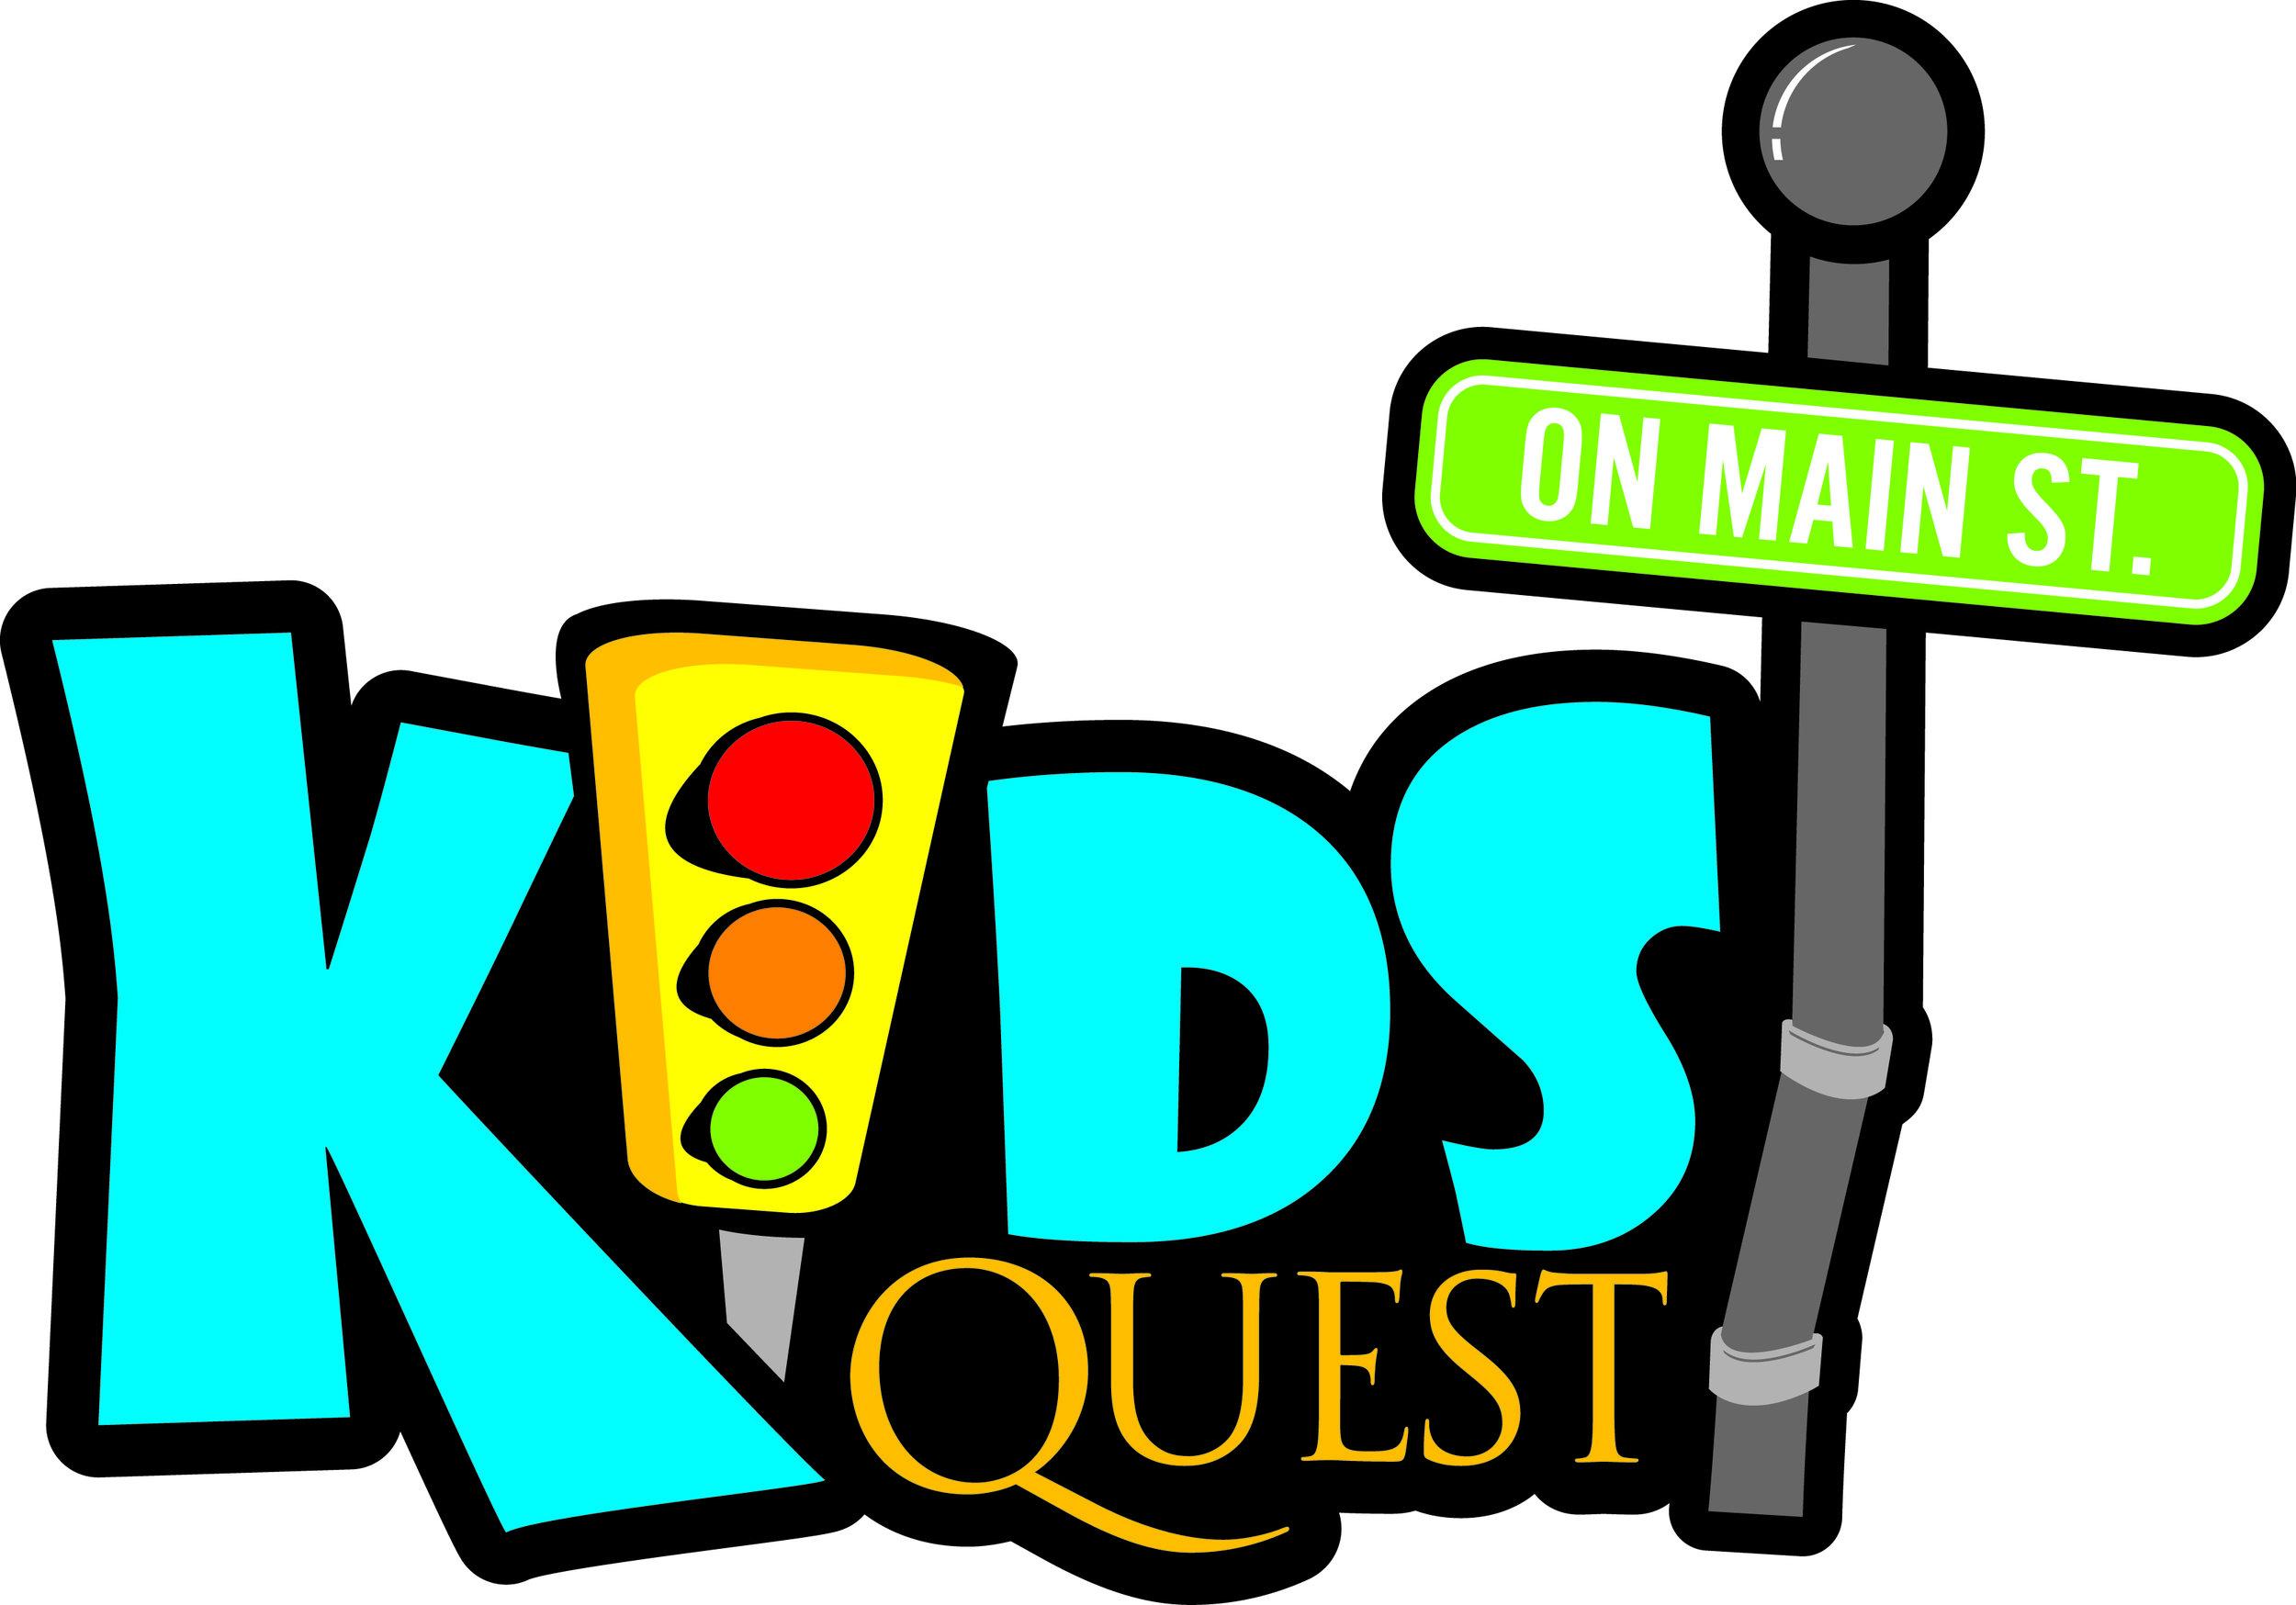 kidsquest.jpg